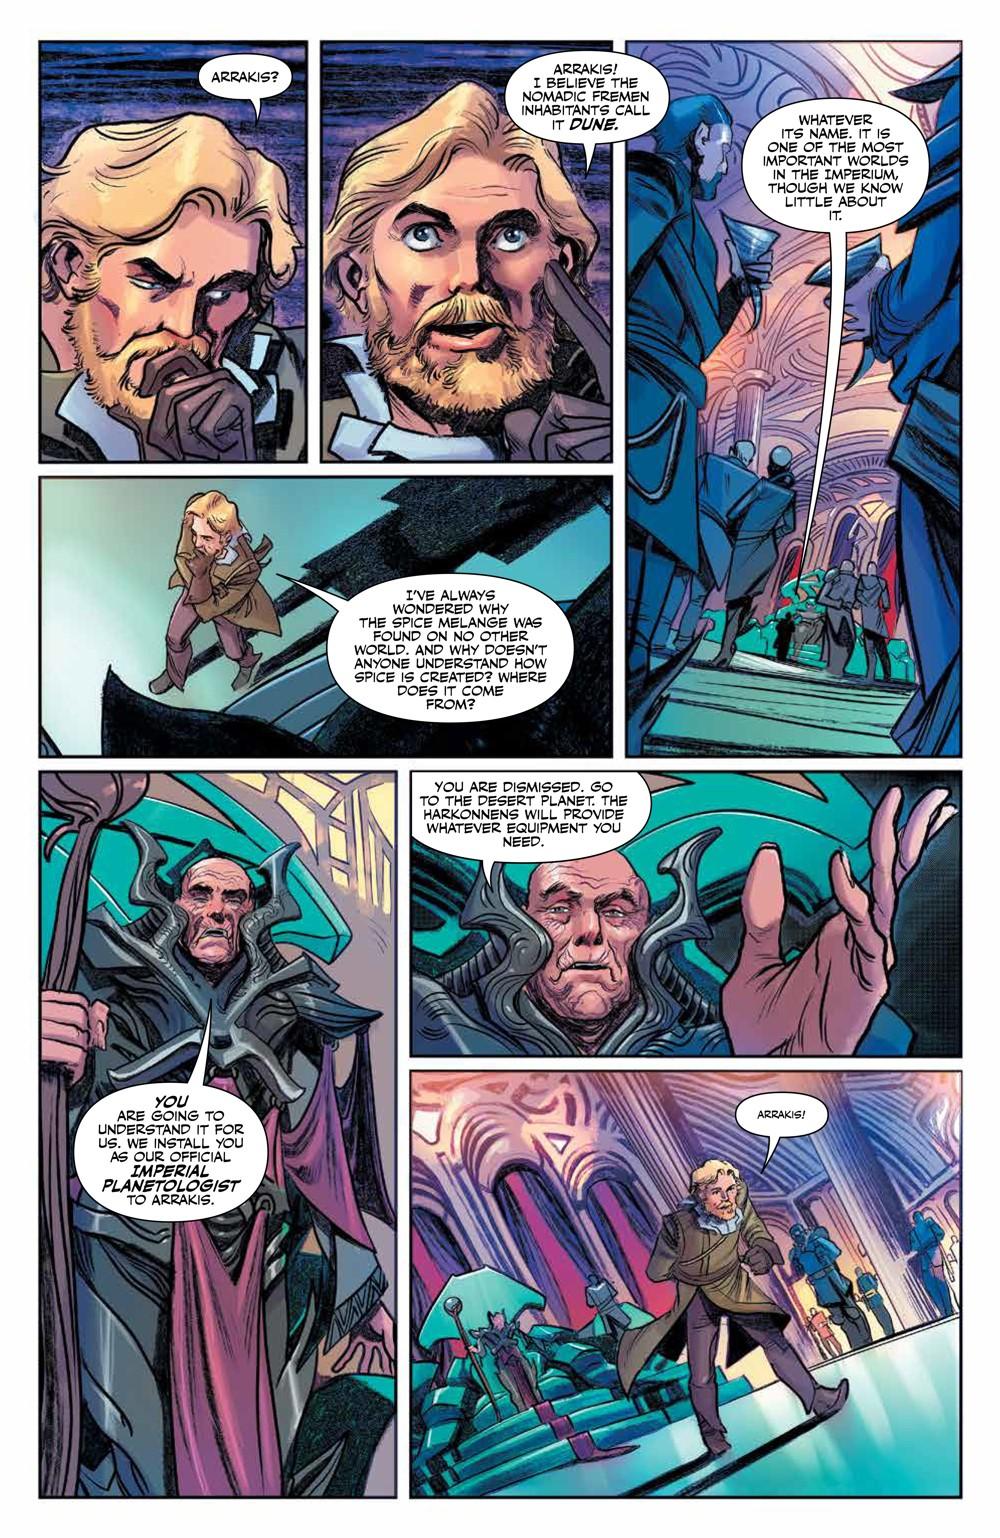 Dune_HouseAtreides_v1_HC_PRESS_16 ComicList Previews: DUNE HOUSE ATREIDES VOLUME 1 HC